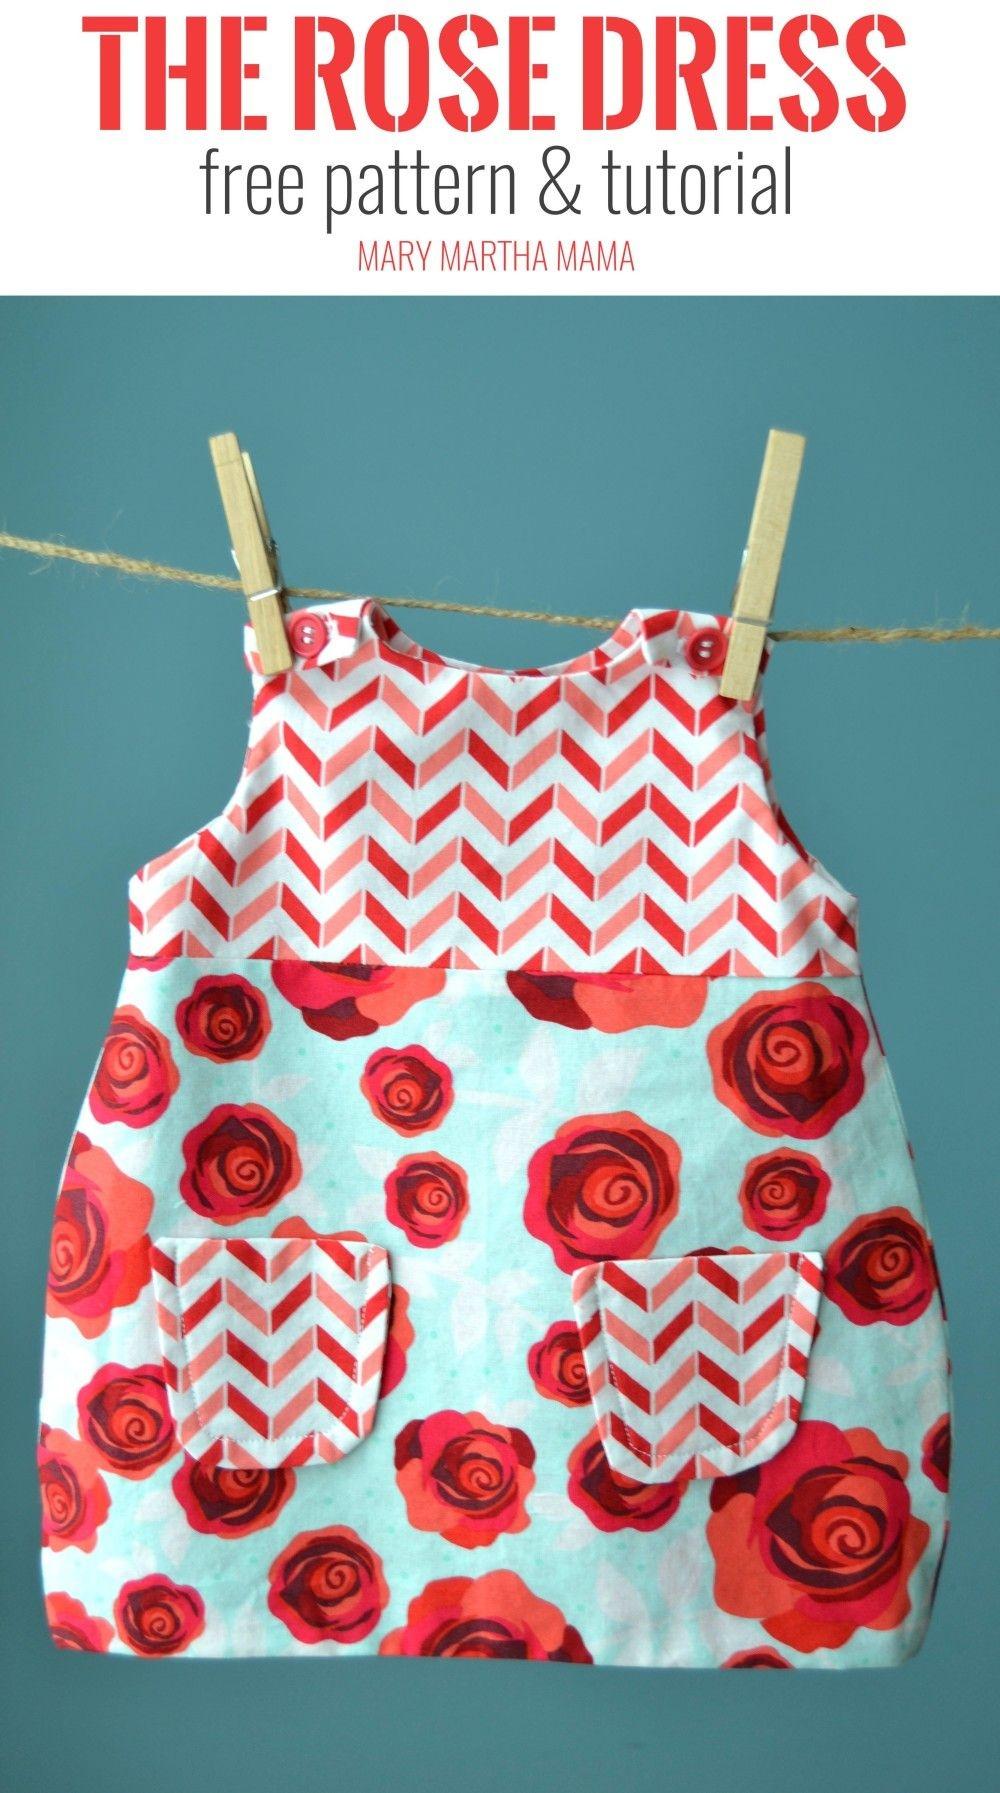 Use This Free Printable Pdf Pattern To Make A Diy Lined Baby Dress - Free Printable Toddler Dress Patterns